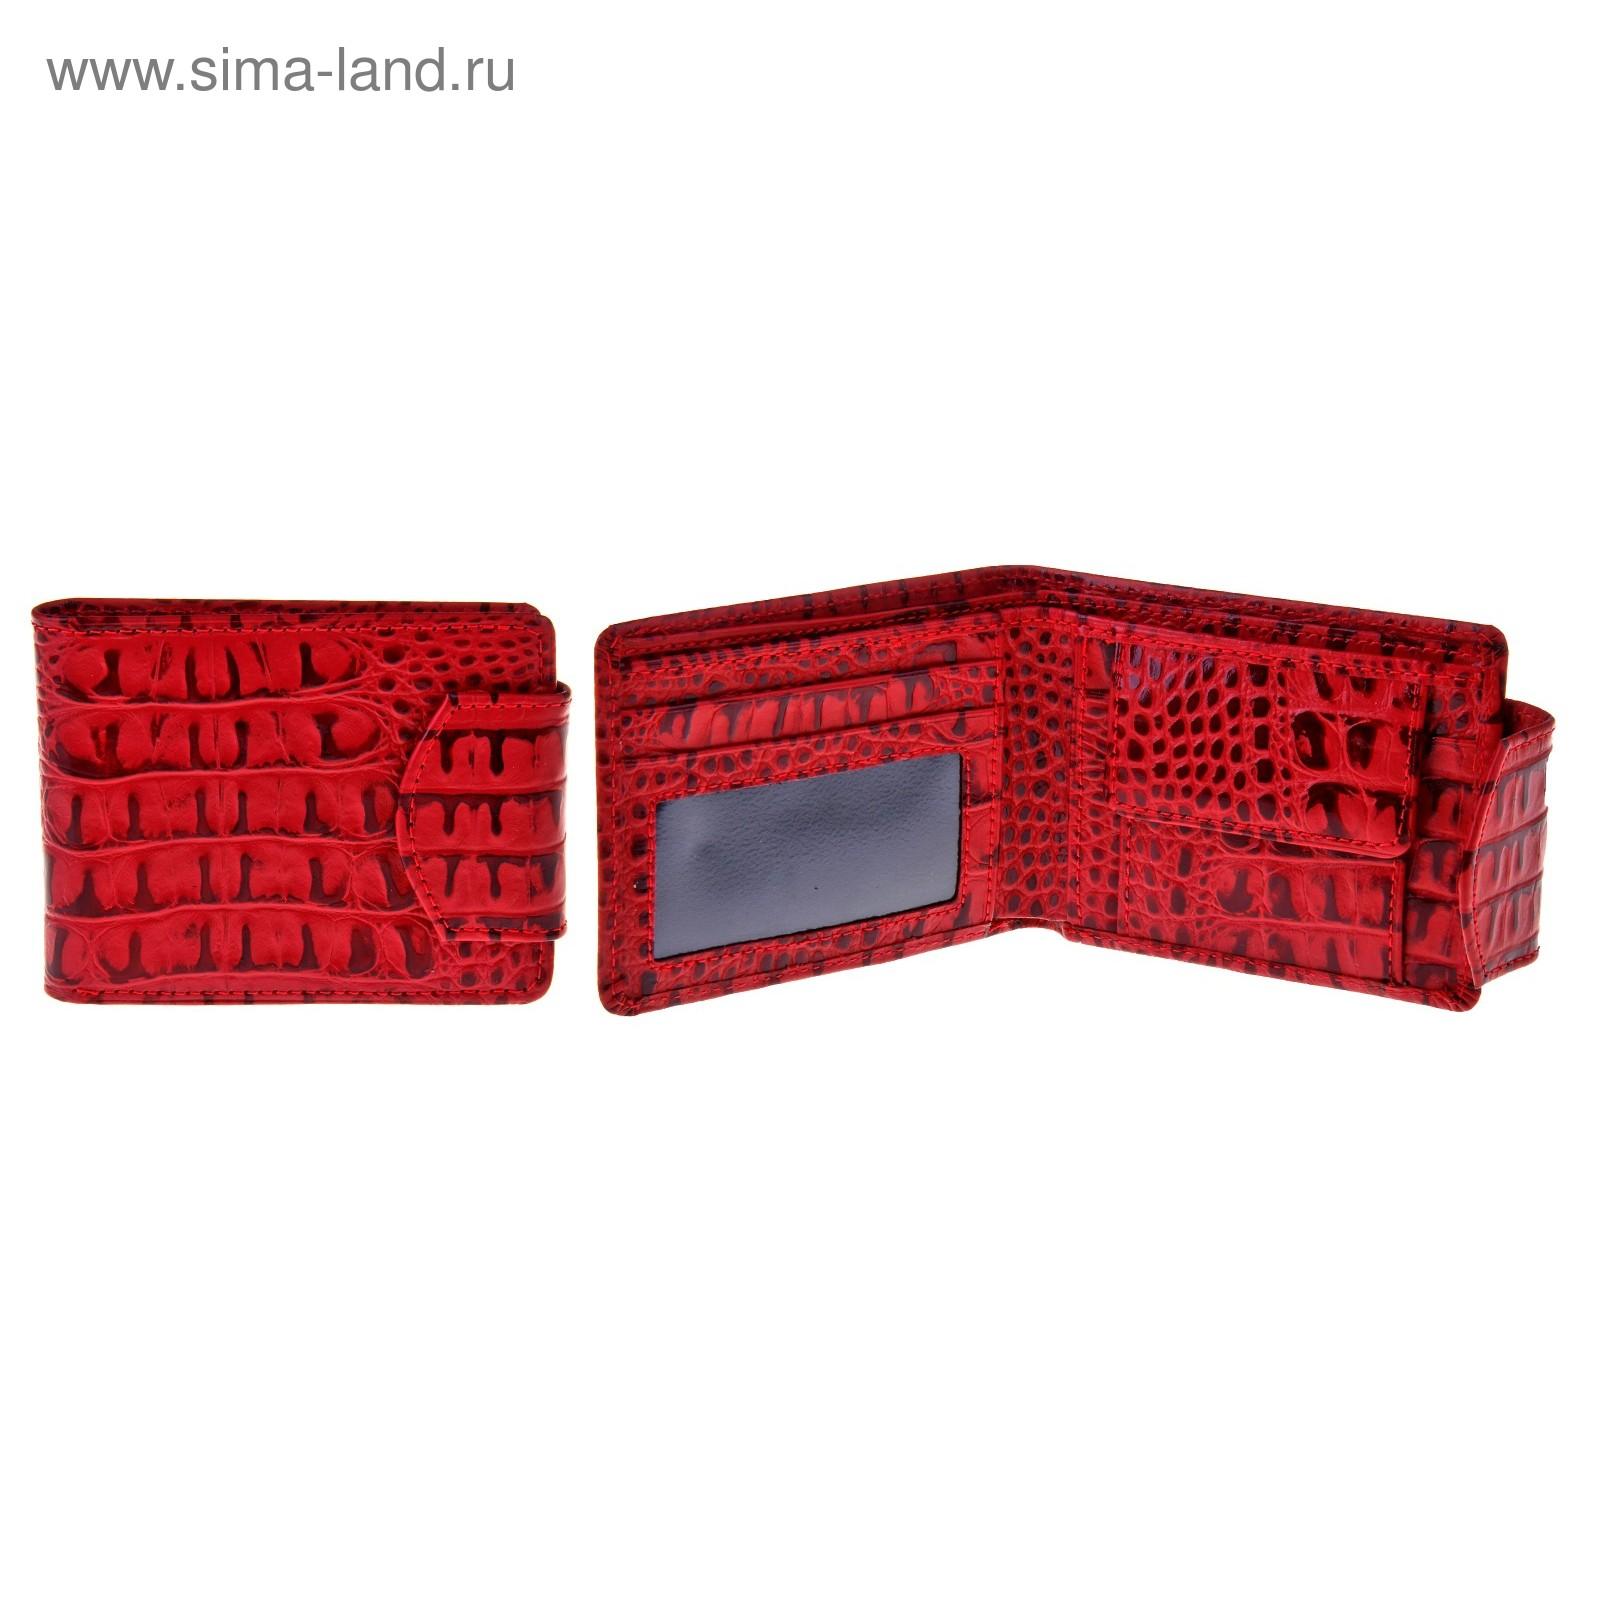 995ce81d93ad Кошелек натуральная кожа, лак 2-х цветный кайман, красный (790983 ...